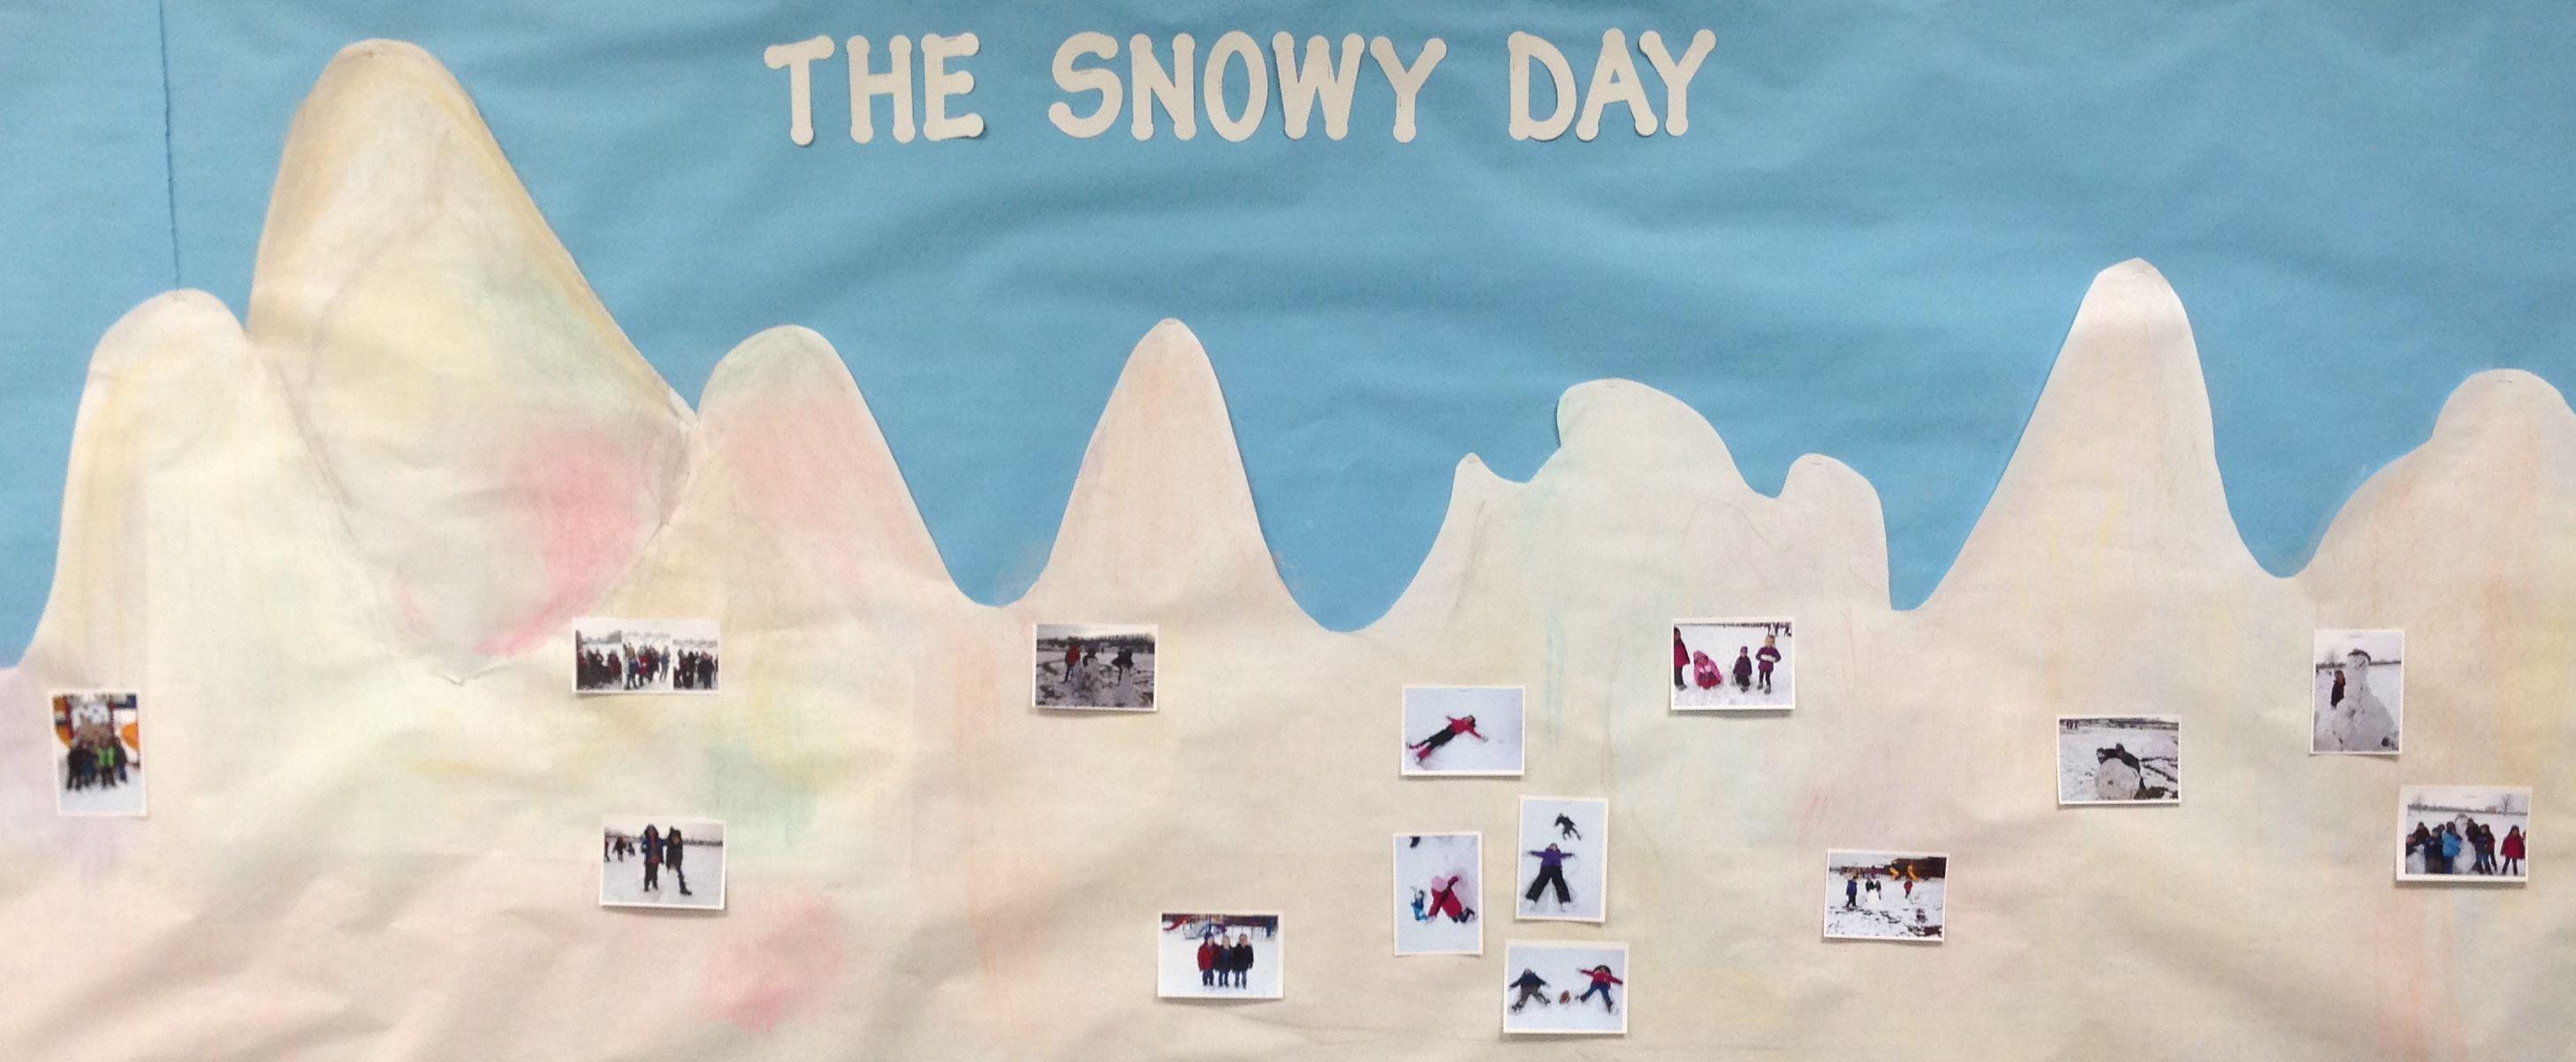 Bulletin Board Based On The Snowy Day By Ezra Jack Keats